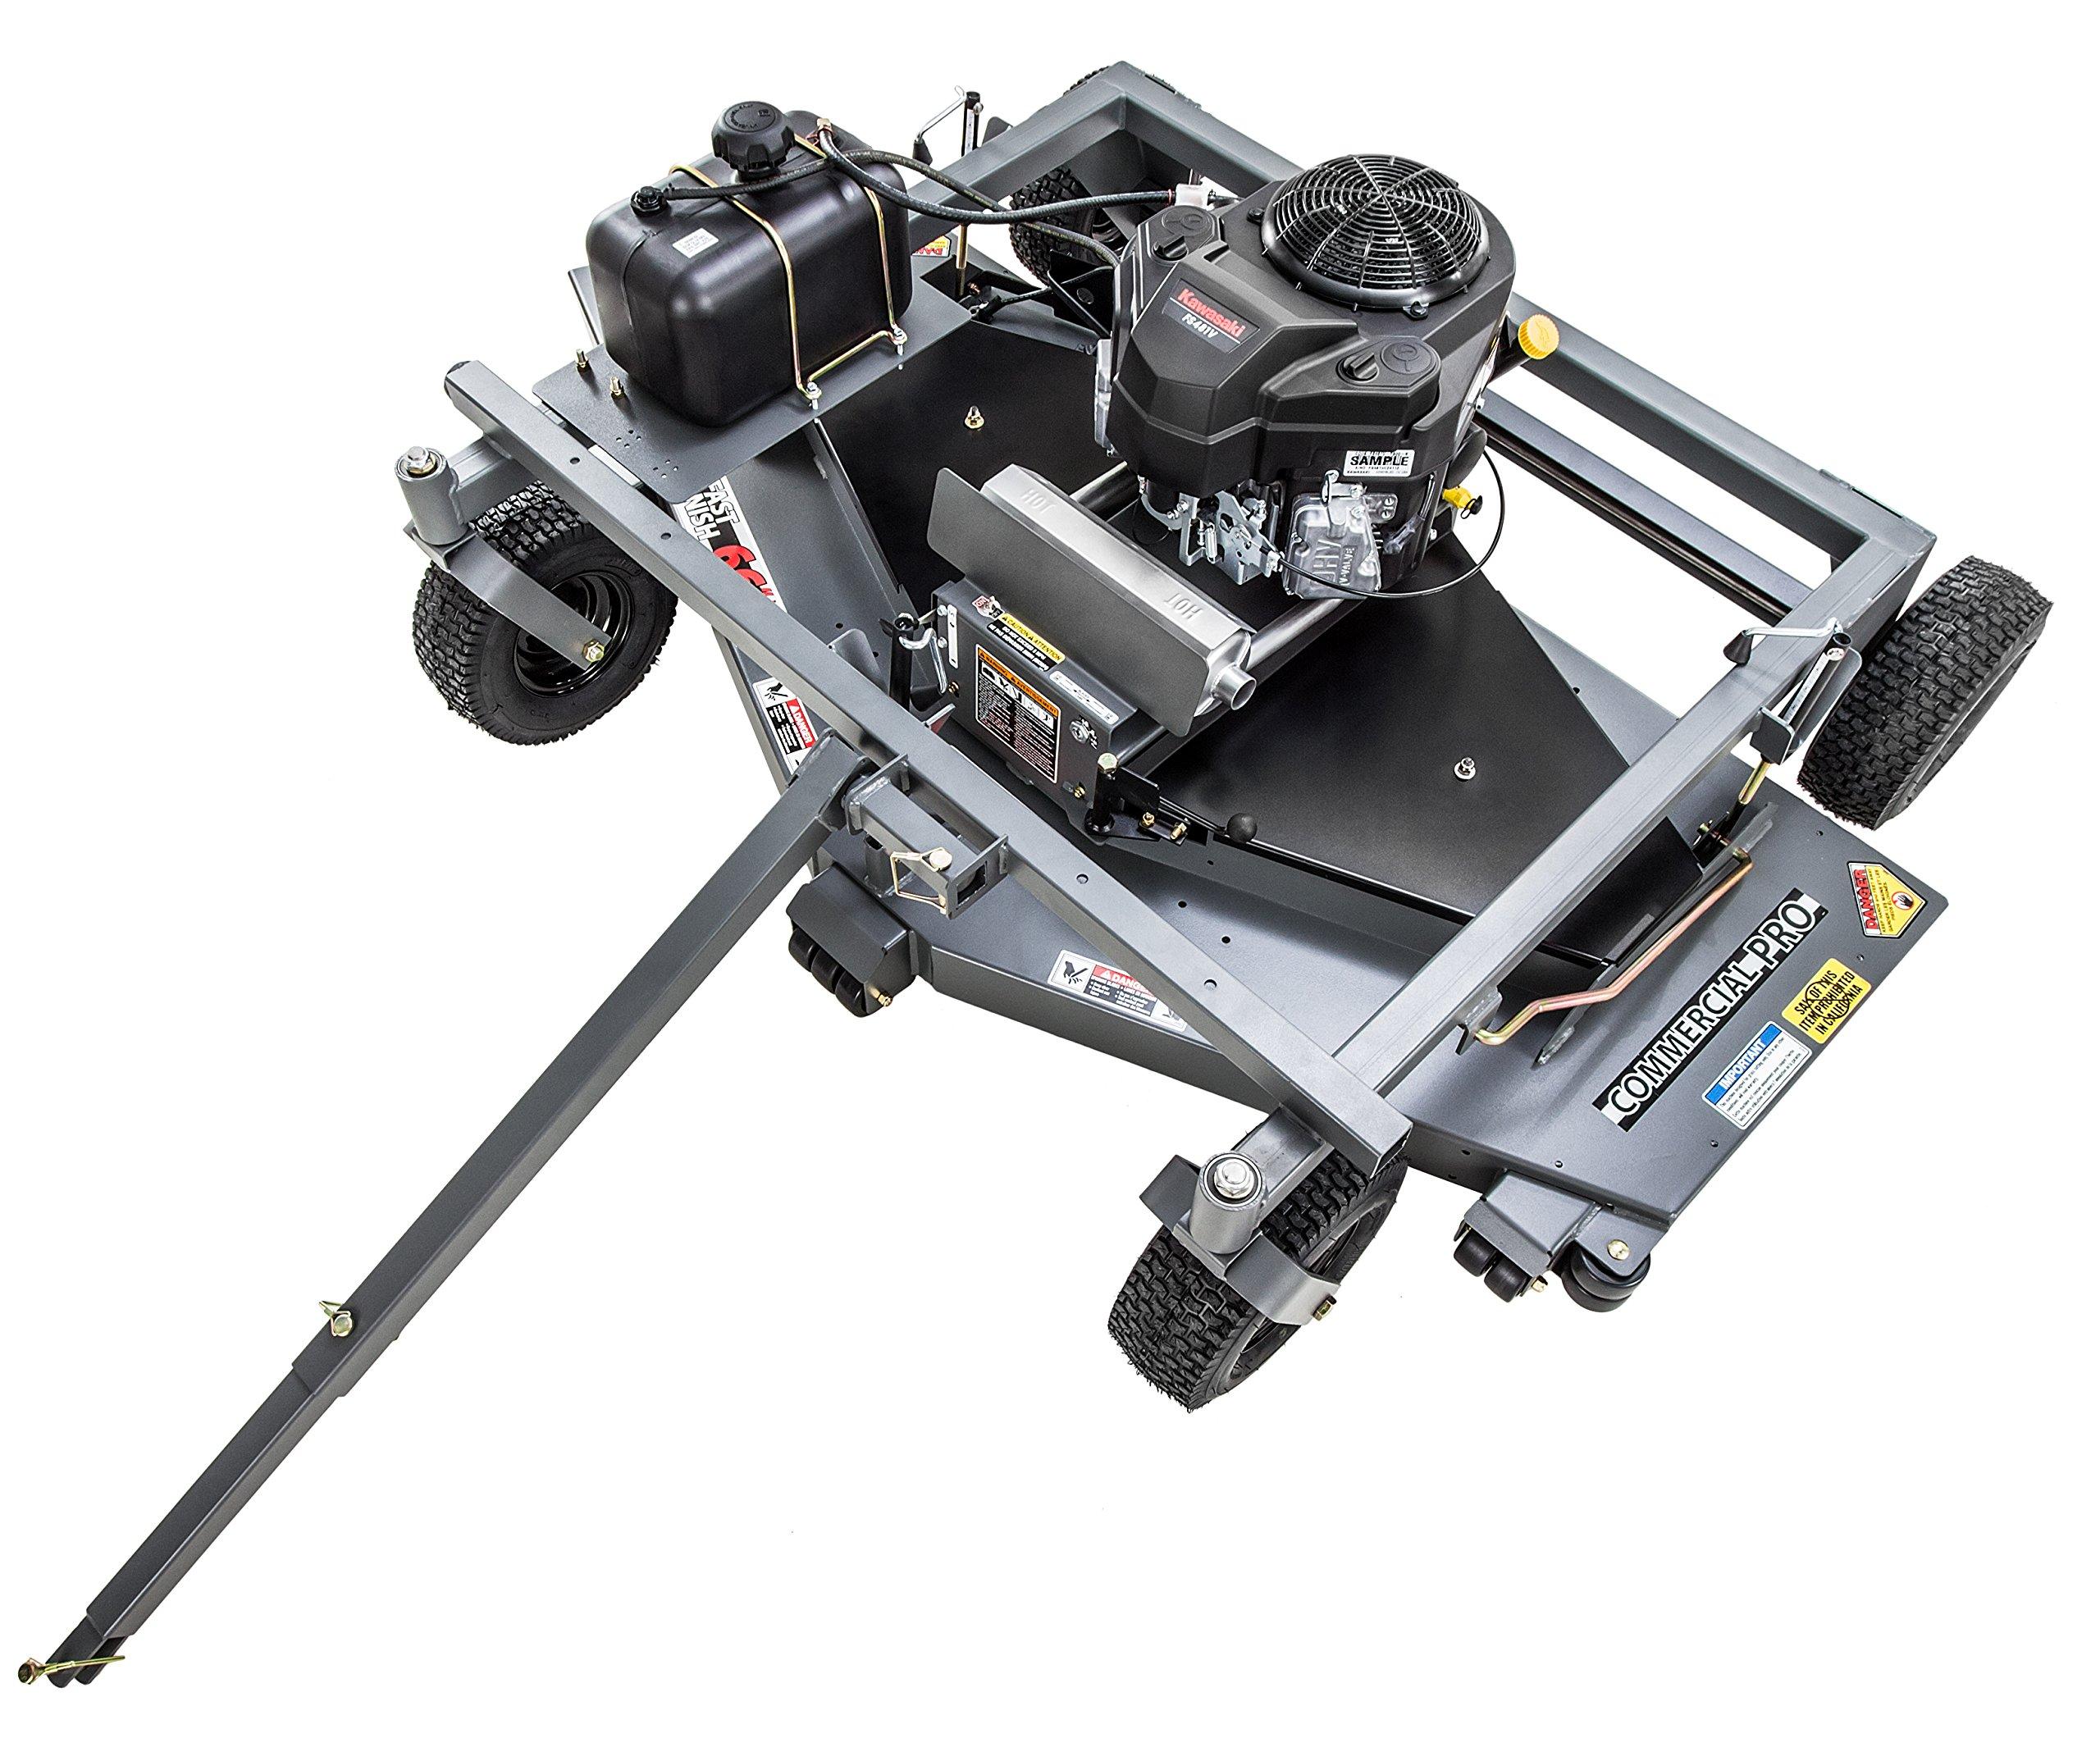 Swisher FC14566CPKA-CA 14.5HP 12V Kawasaki Commercial Pro Trail Mower California Compliant, Gray, 66''